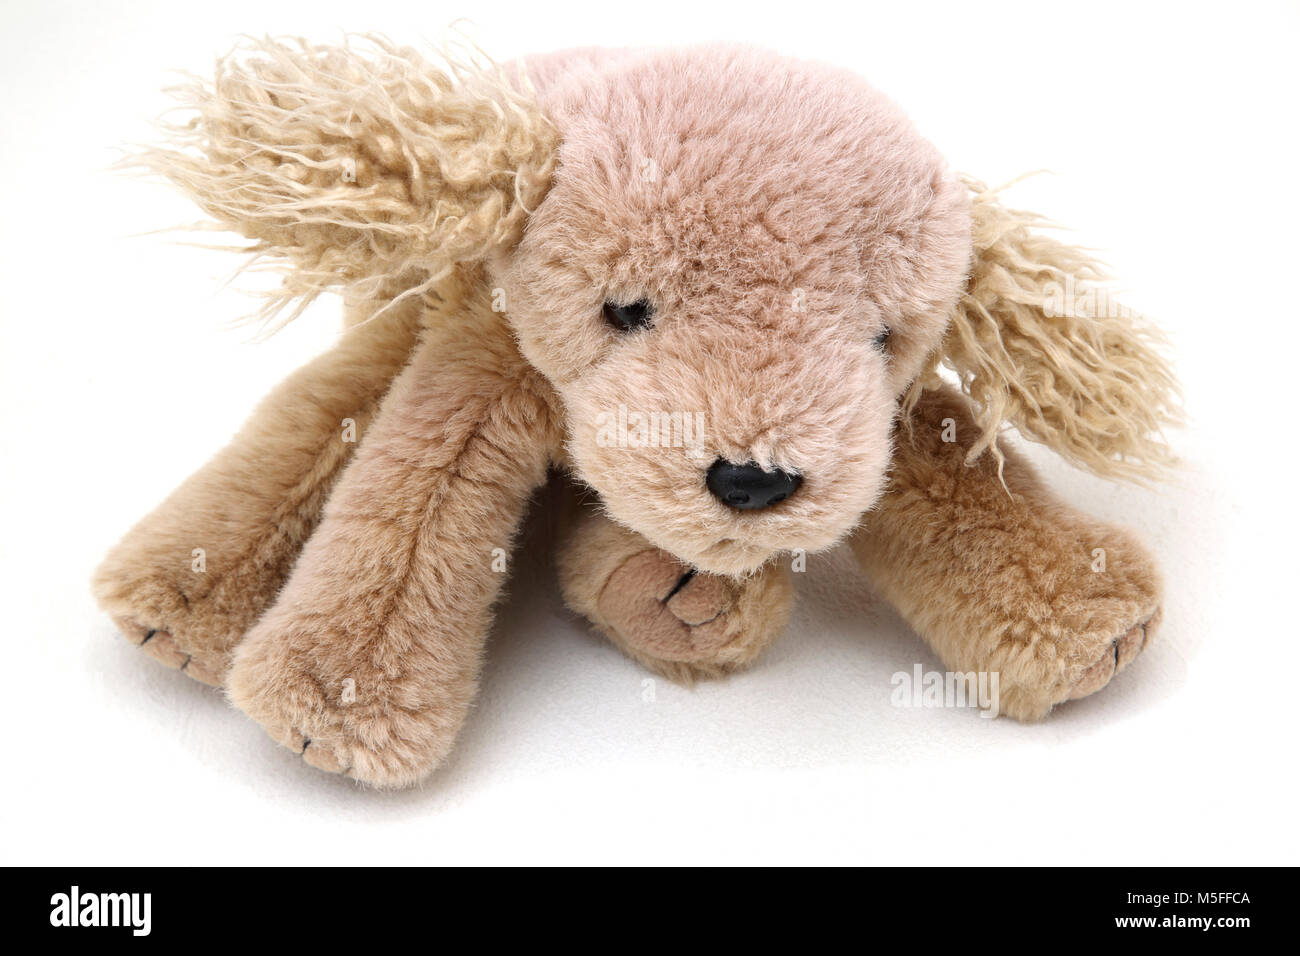 TY Beanie Baby Dog - Stock Image